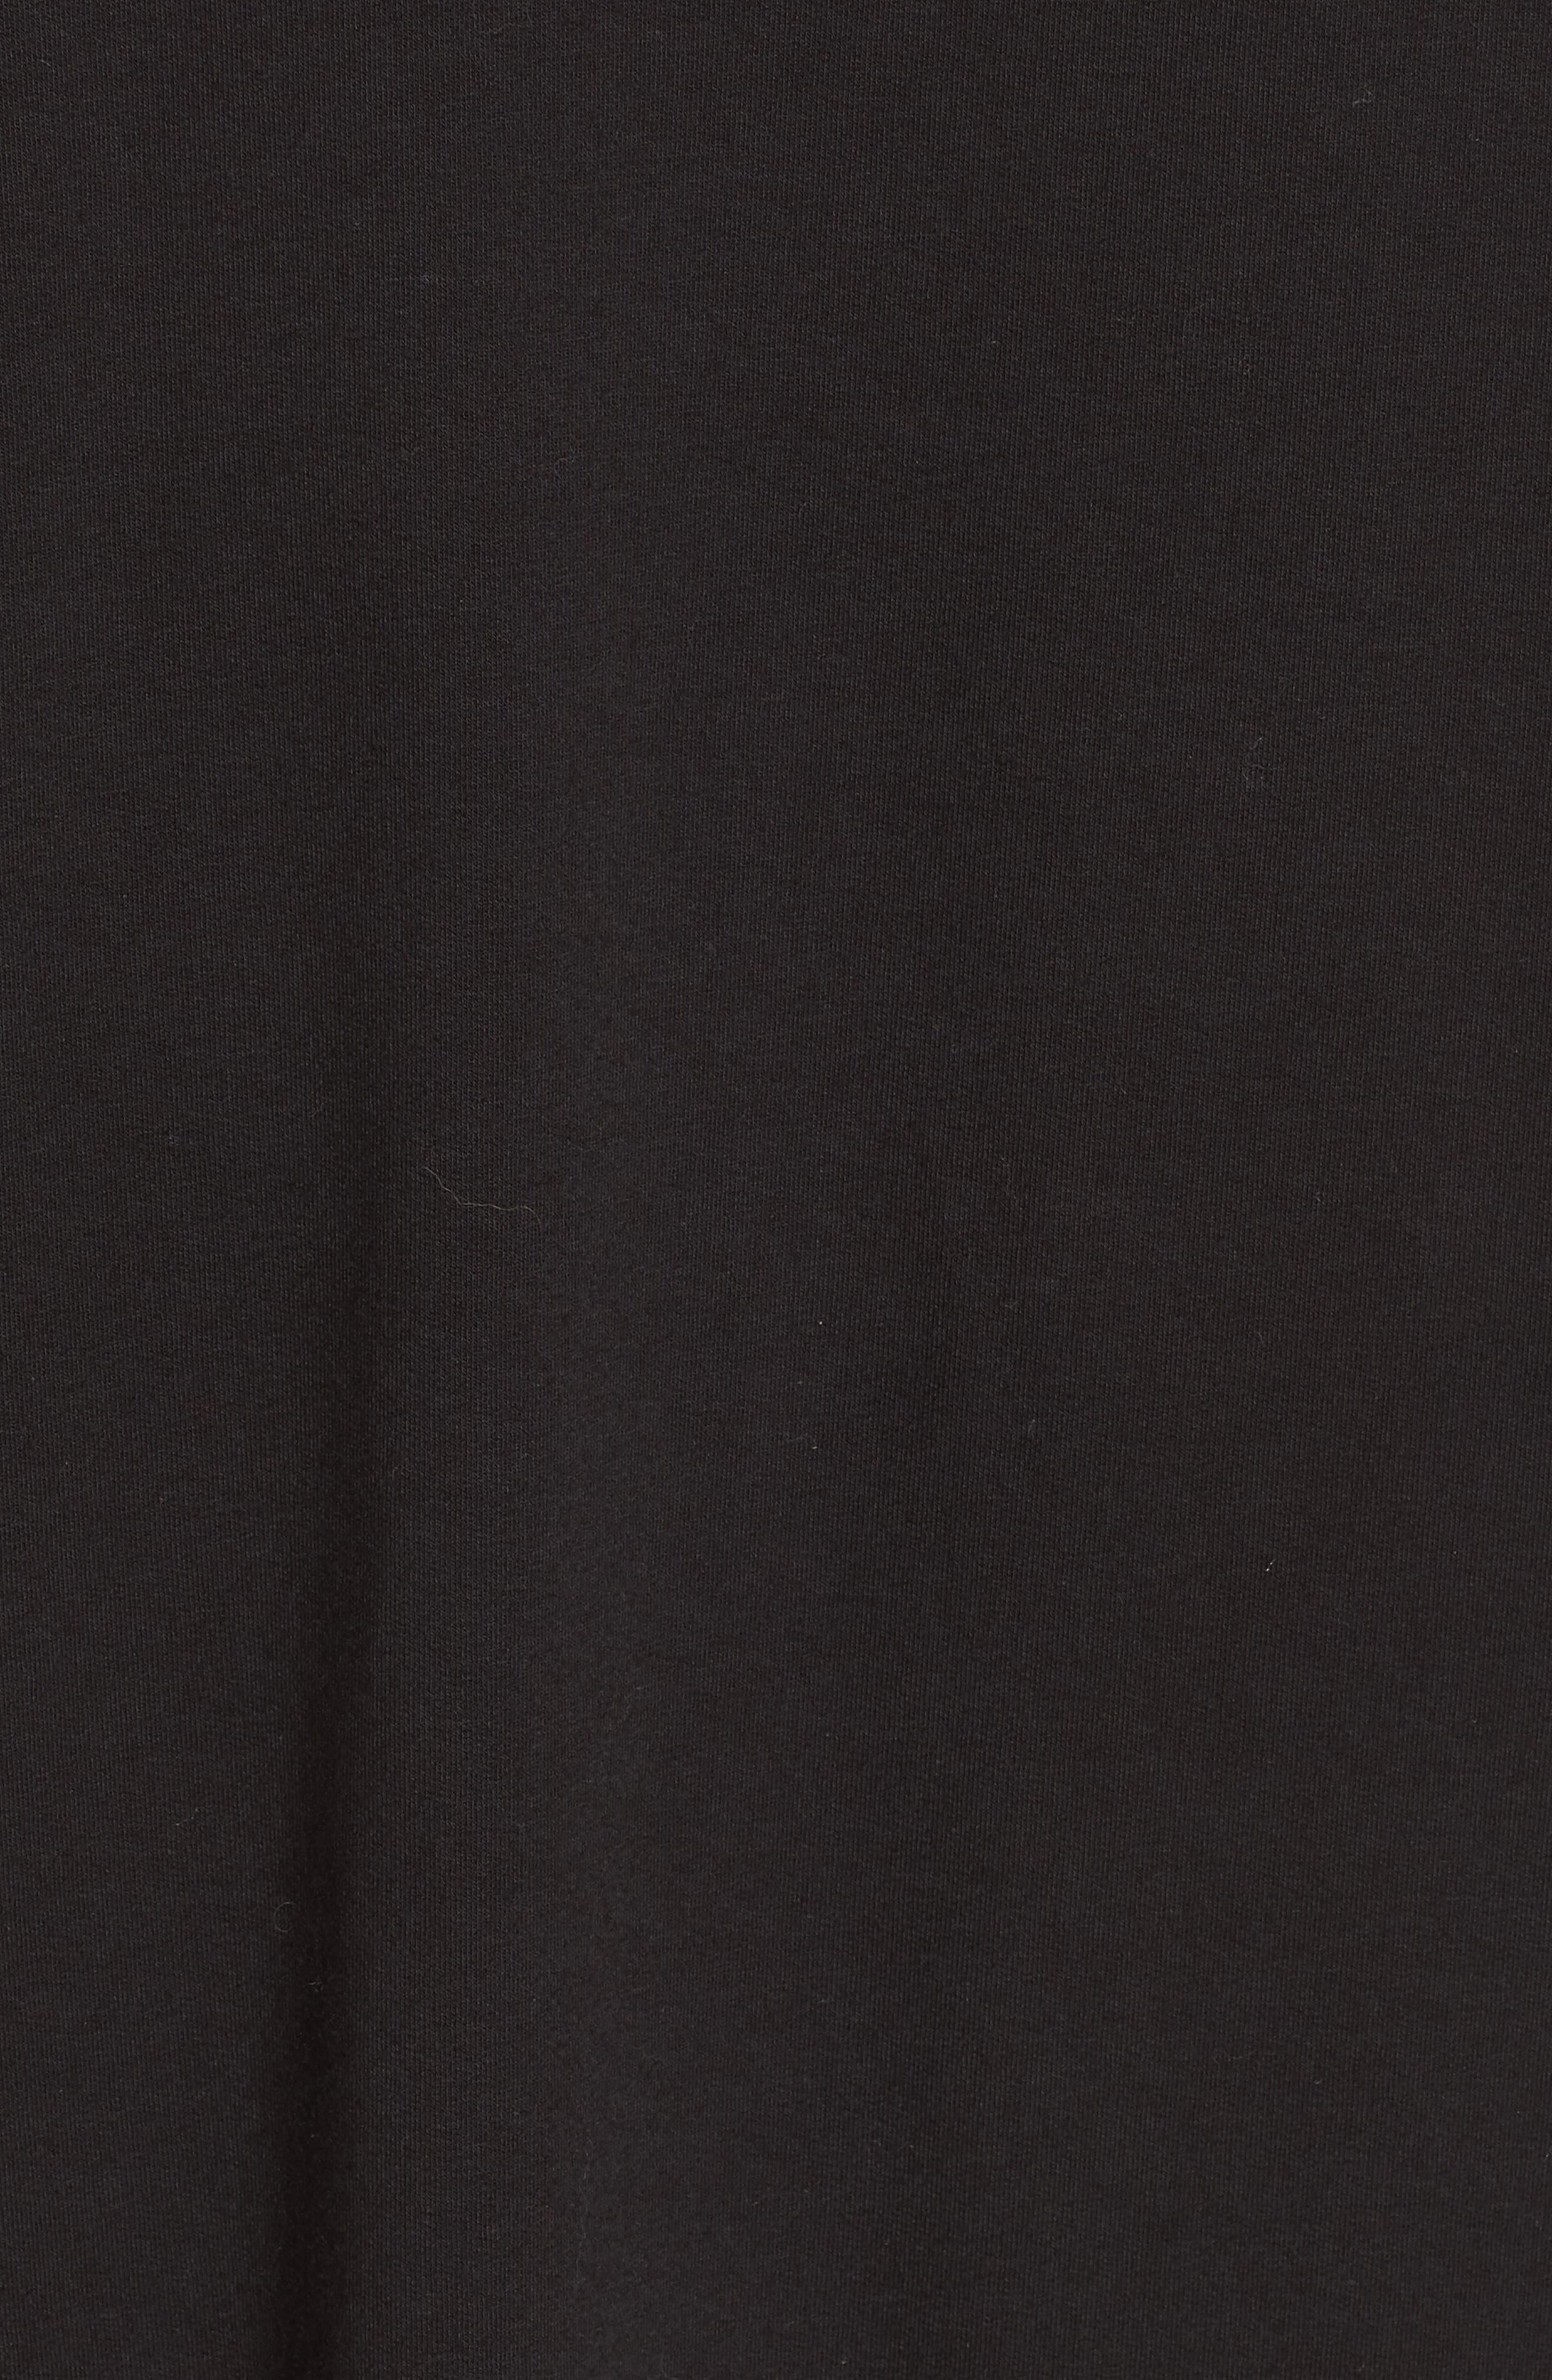 Asymmetric Sweatshirt Dress,                             Alternate thumbnail 6, color,                             BLACK